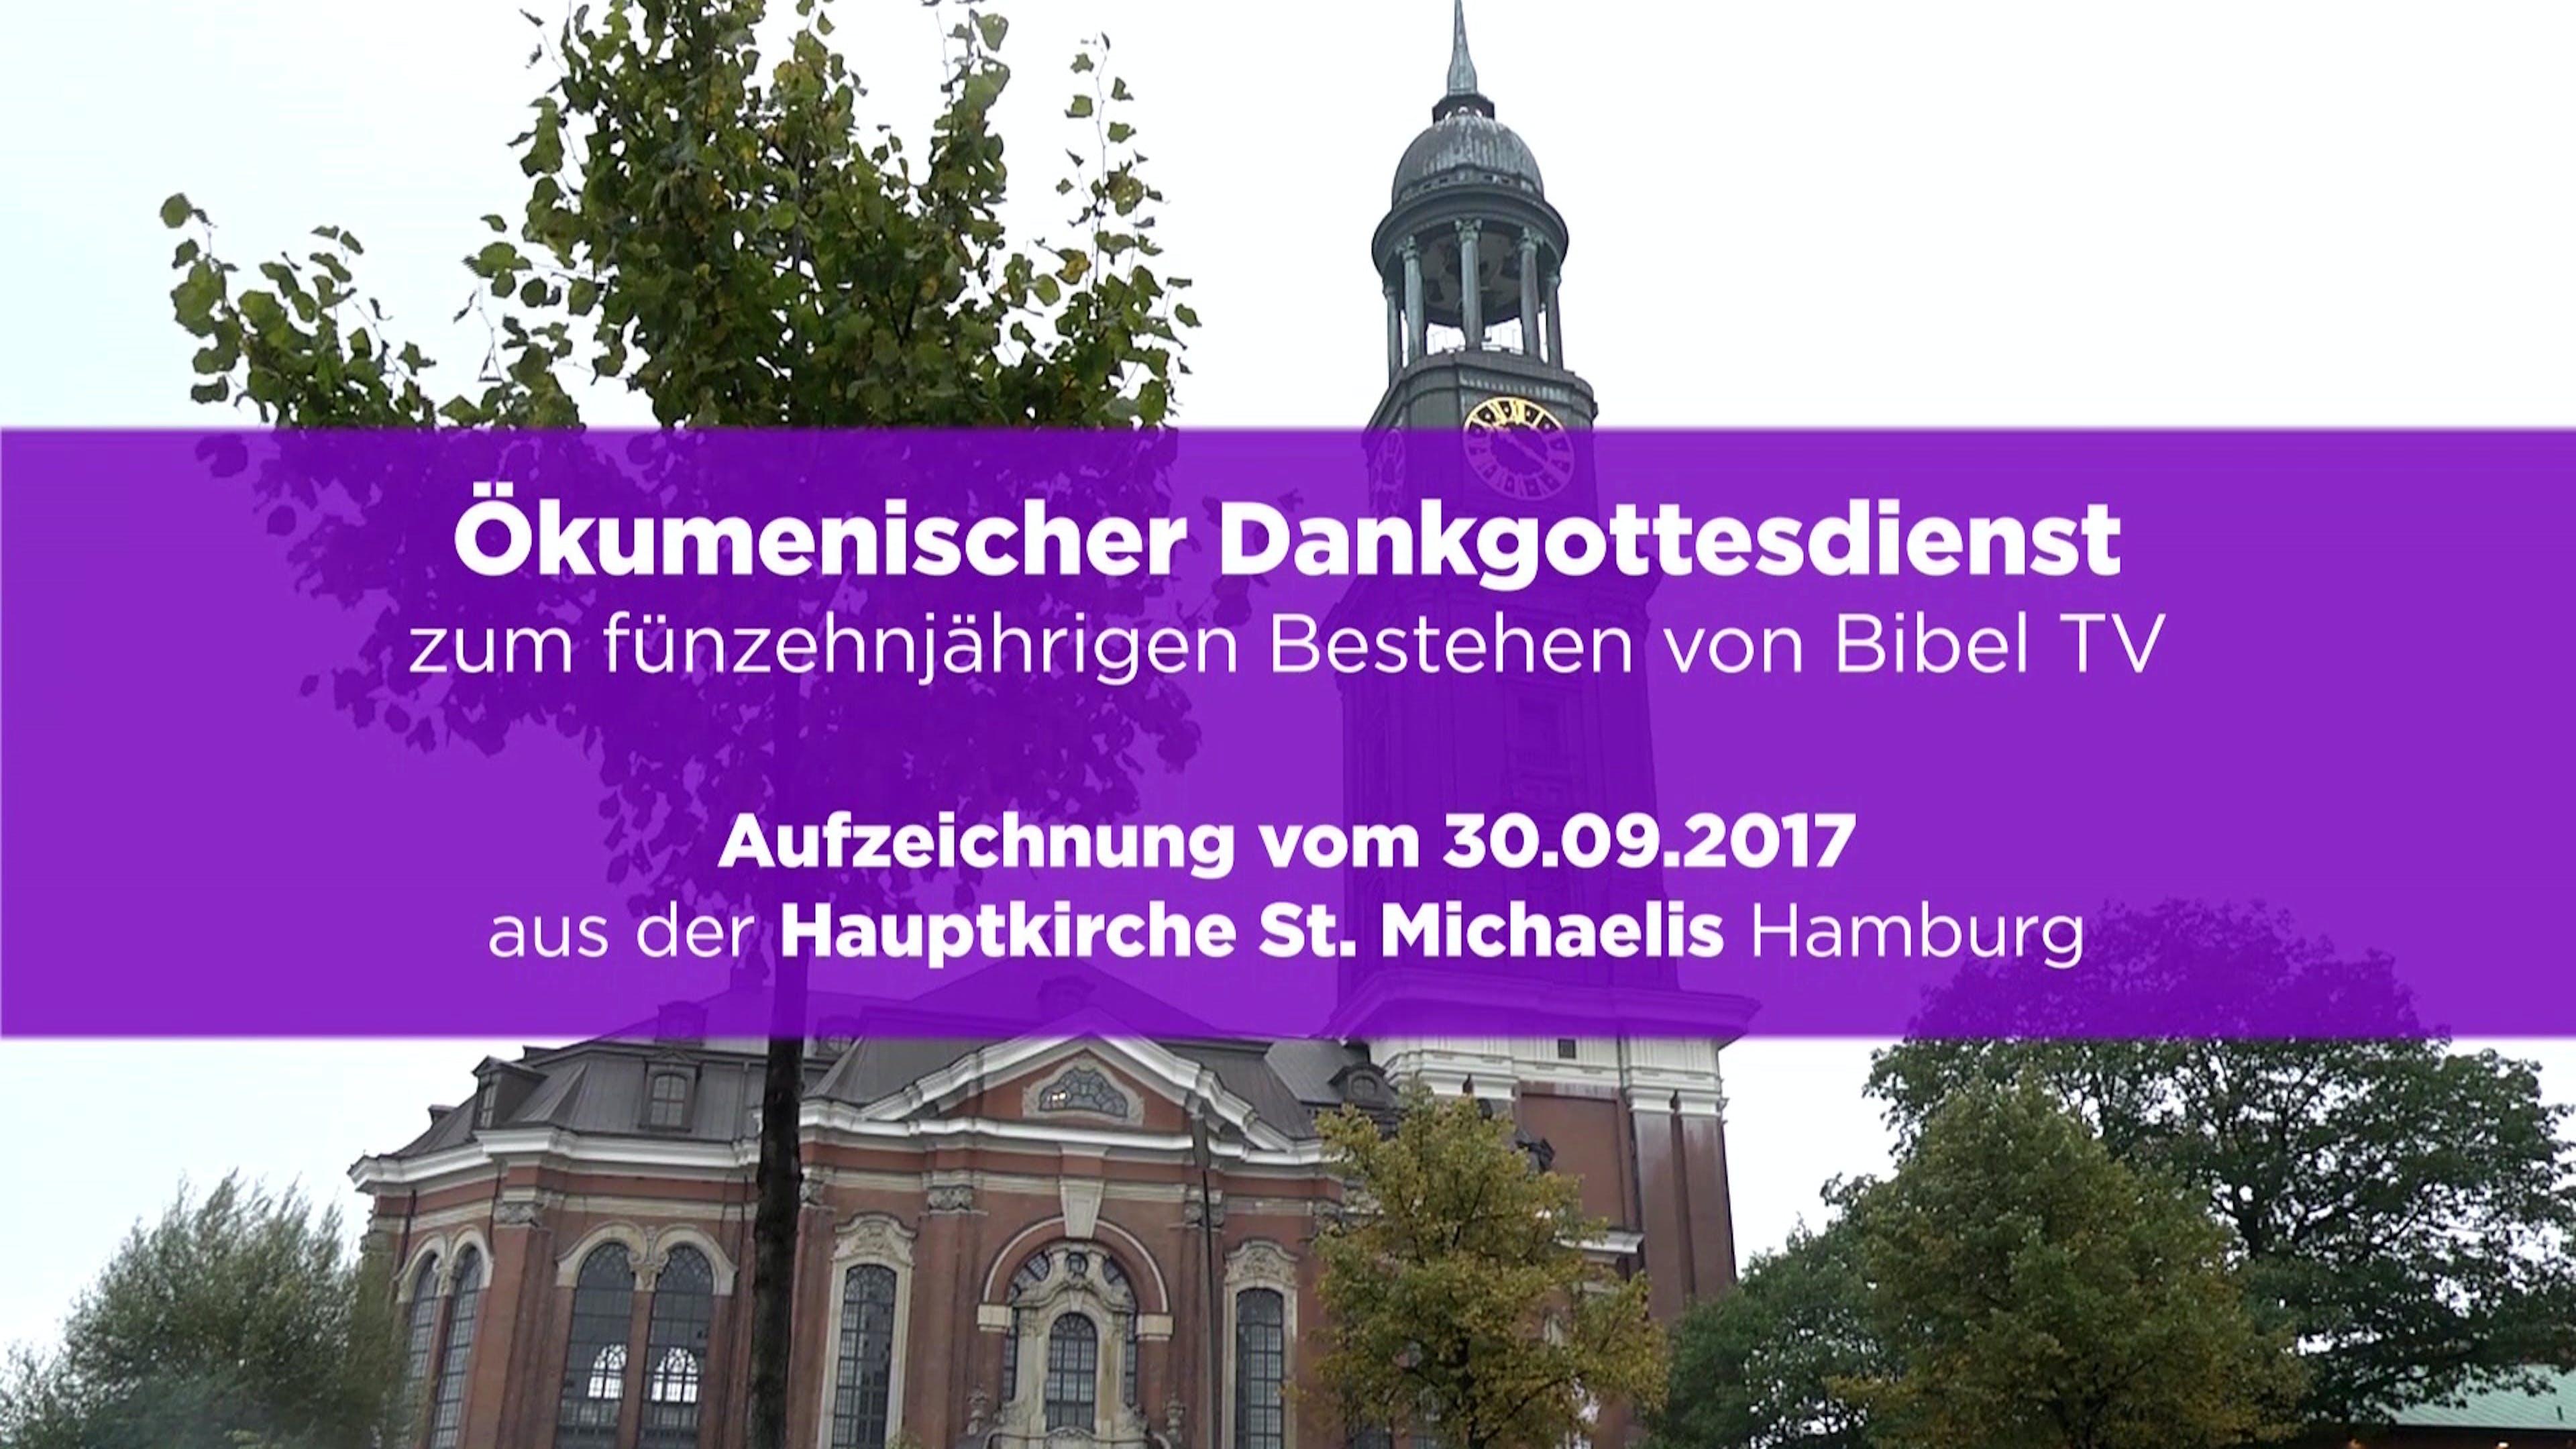 15 Jahre Bibel TV